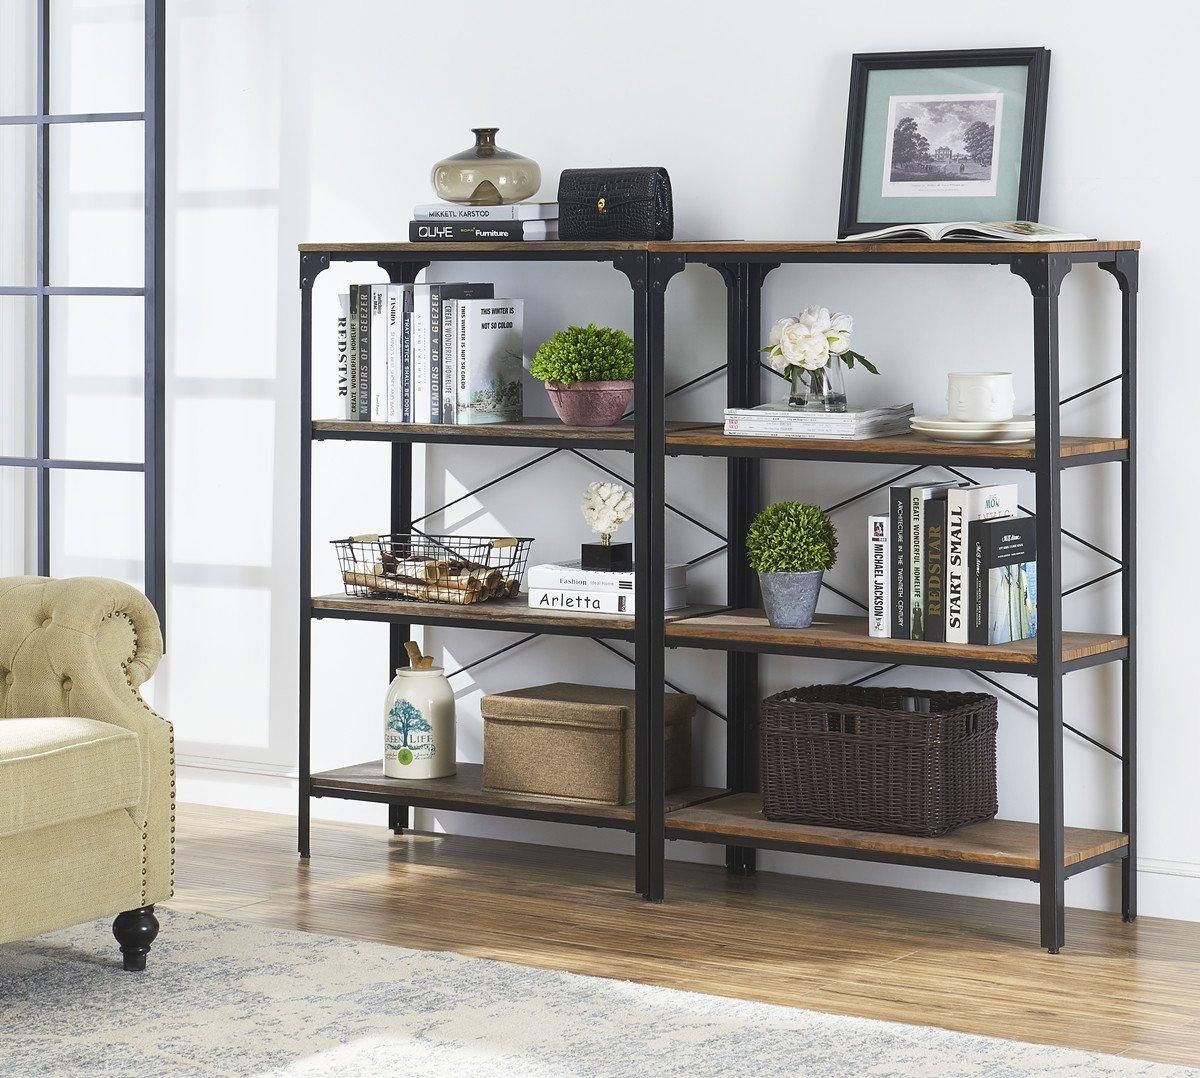 "O&K Furniture 4-Shelf Industrial Vintage Bookcase, Metal Bookshelf, 48""H x 33""W x 13""D, Barn-Wood Finish by O&K Furniture (Image #4)"